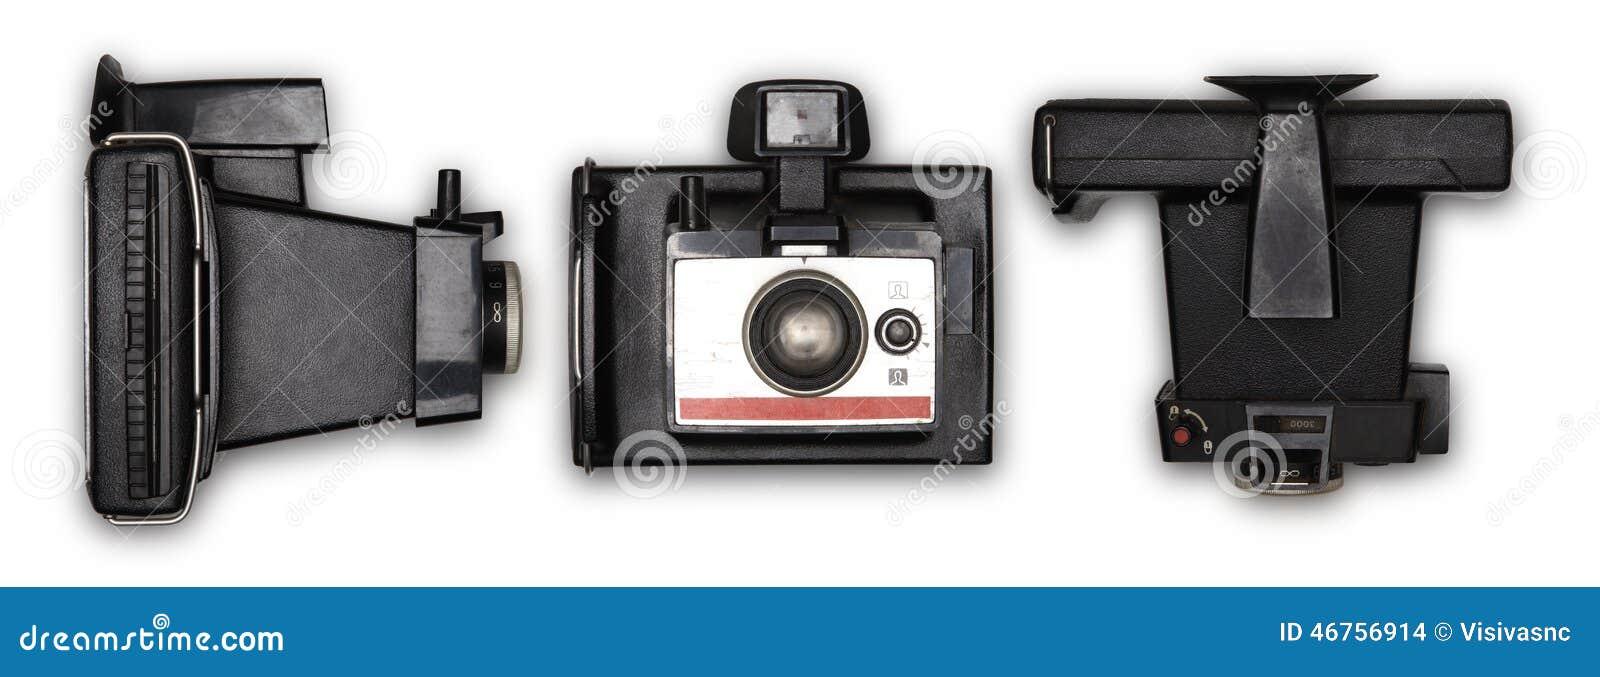 Old polaroid photo camera stock photo. Image of body ...